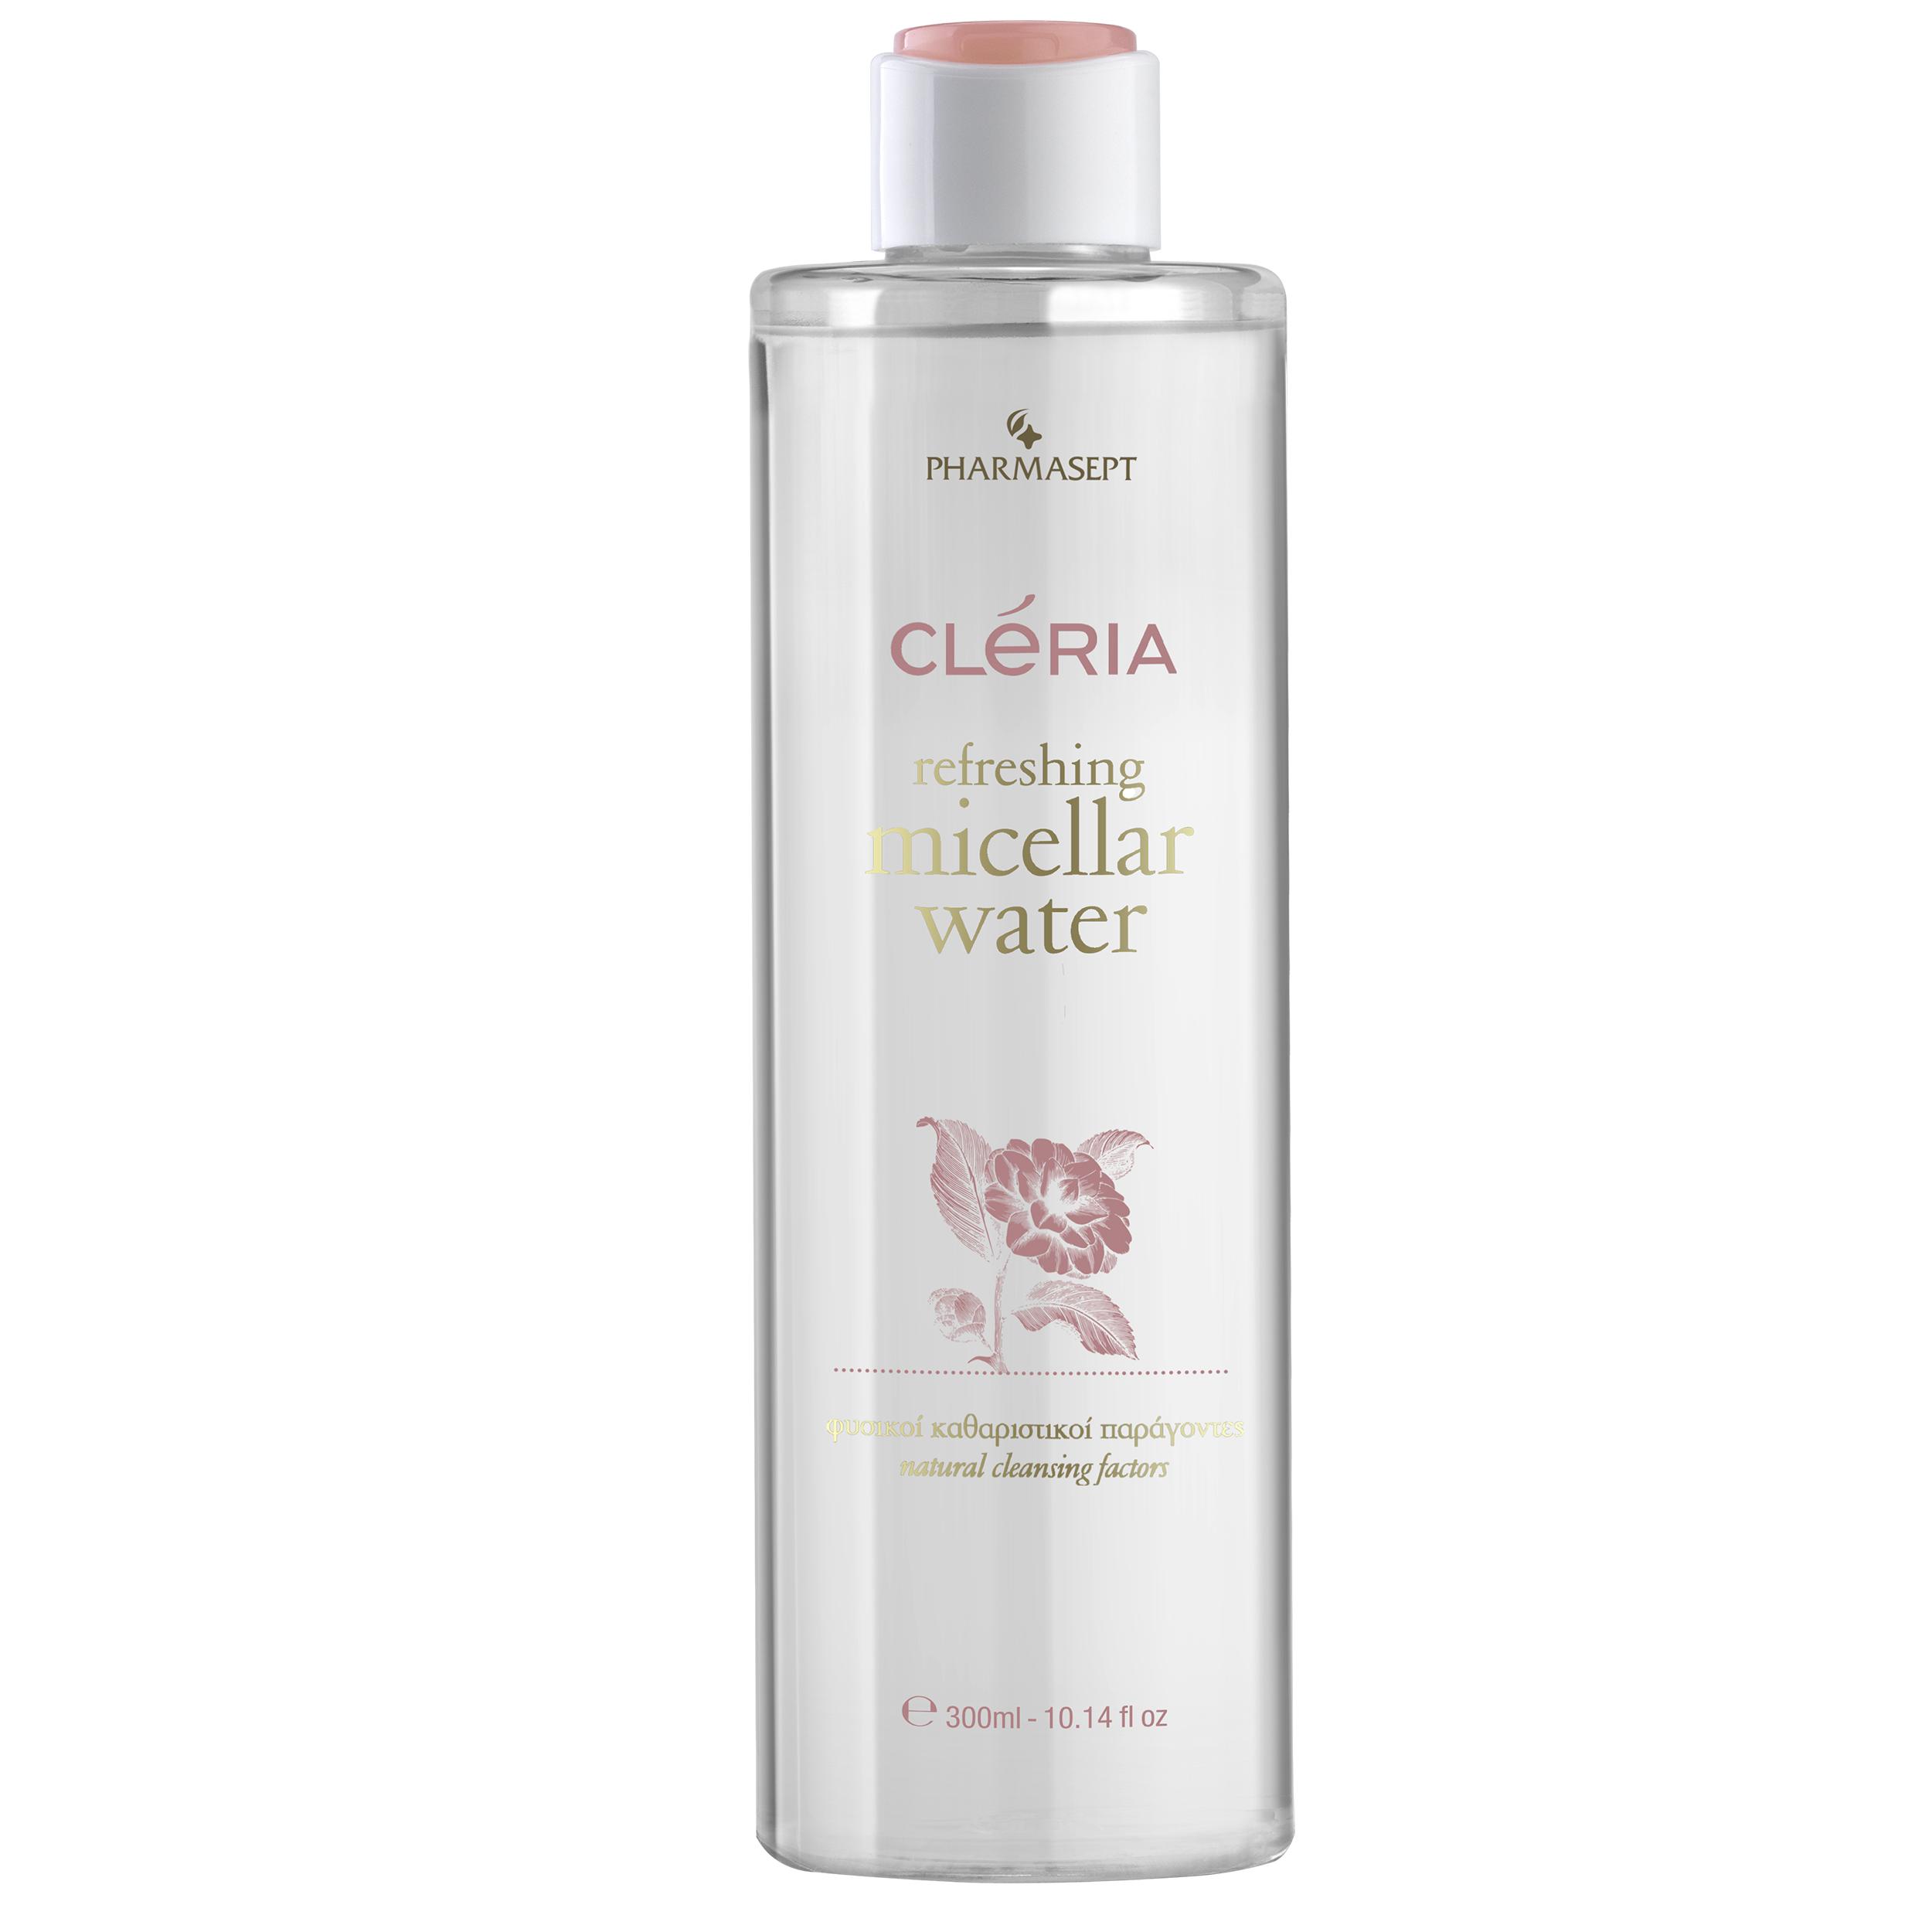 Pharmasept Cleria Refreshing Micellar Water Νερό Ντεμακιγιάζ για Πρόσωπο & ΜάτιαAll Skin Types 300ml